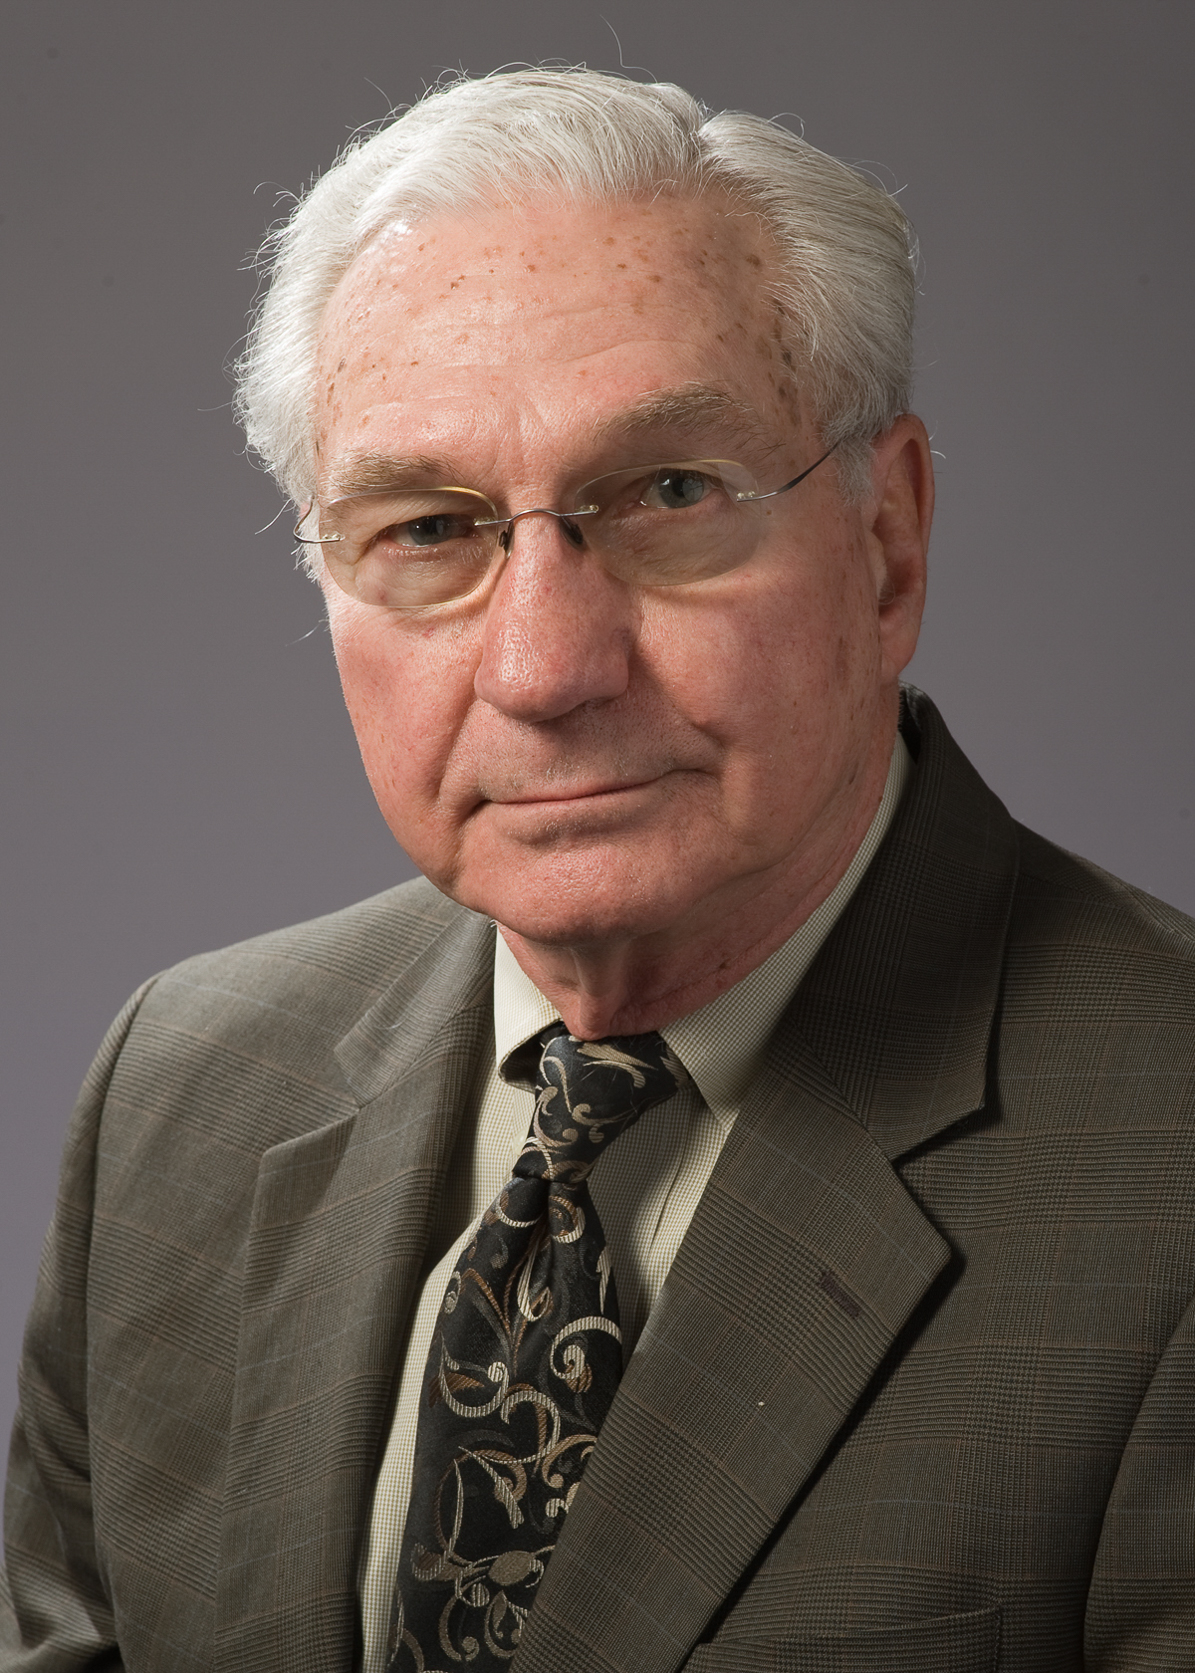 Ronald C. Kidd